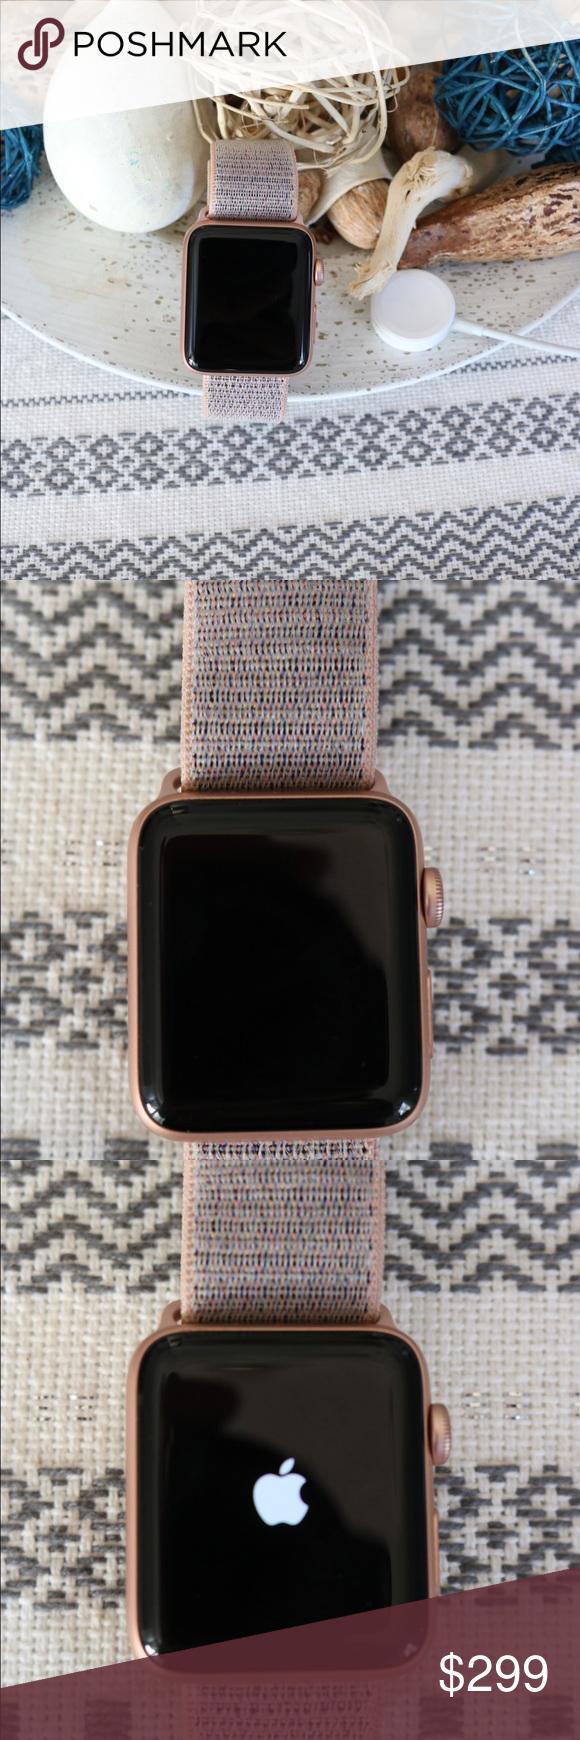 Rose Gold Apple Watch Series 3 42mm Pink Loop Band Rose Gold Apple Watch Apple Watch Apple Watch Series 3